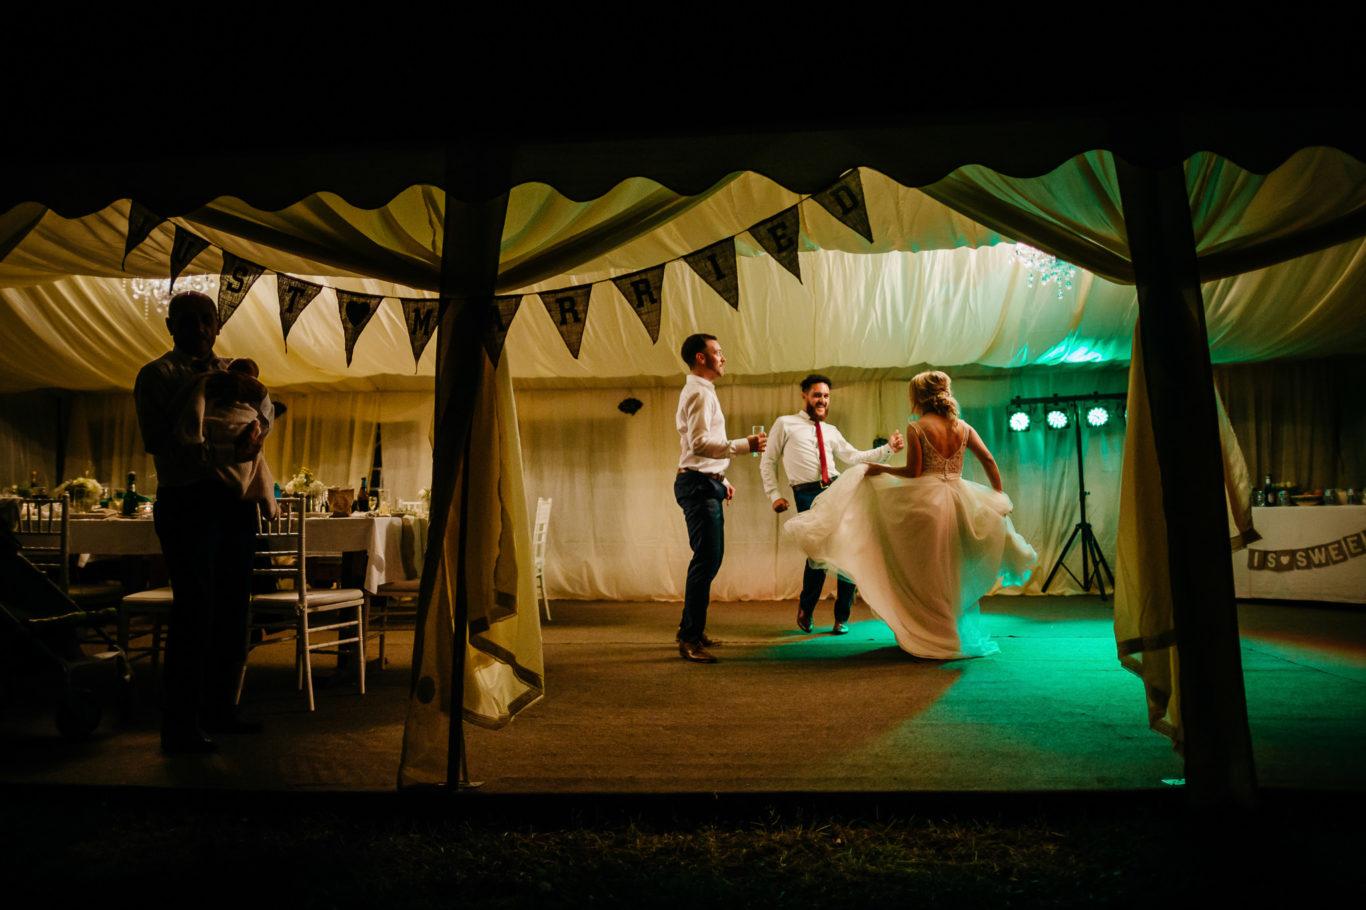 0636-fotografie-nunta-conacul-apafi-ana-simion-fotograf-ciprian-dumitrescu-dc1_0225-2